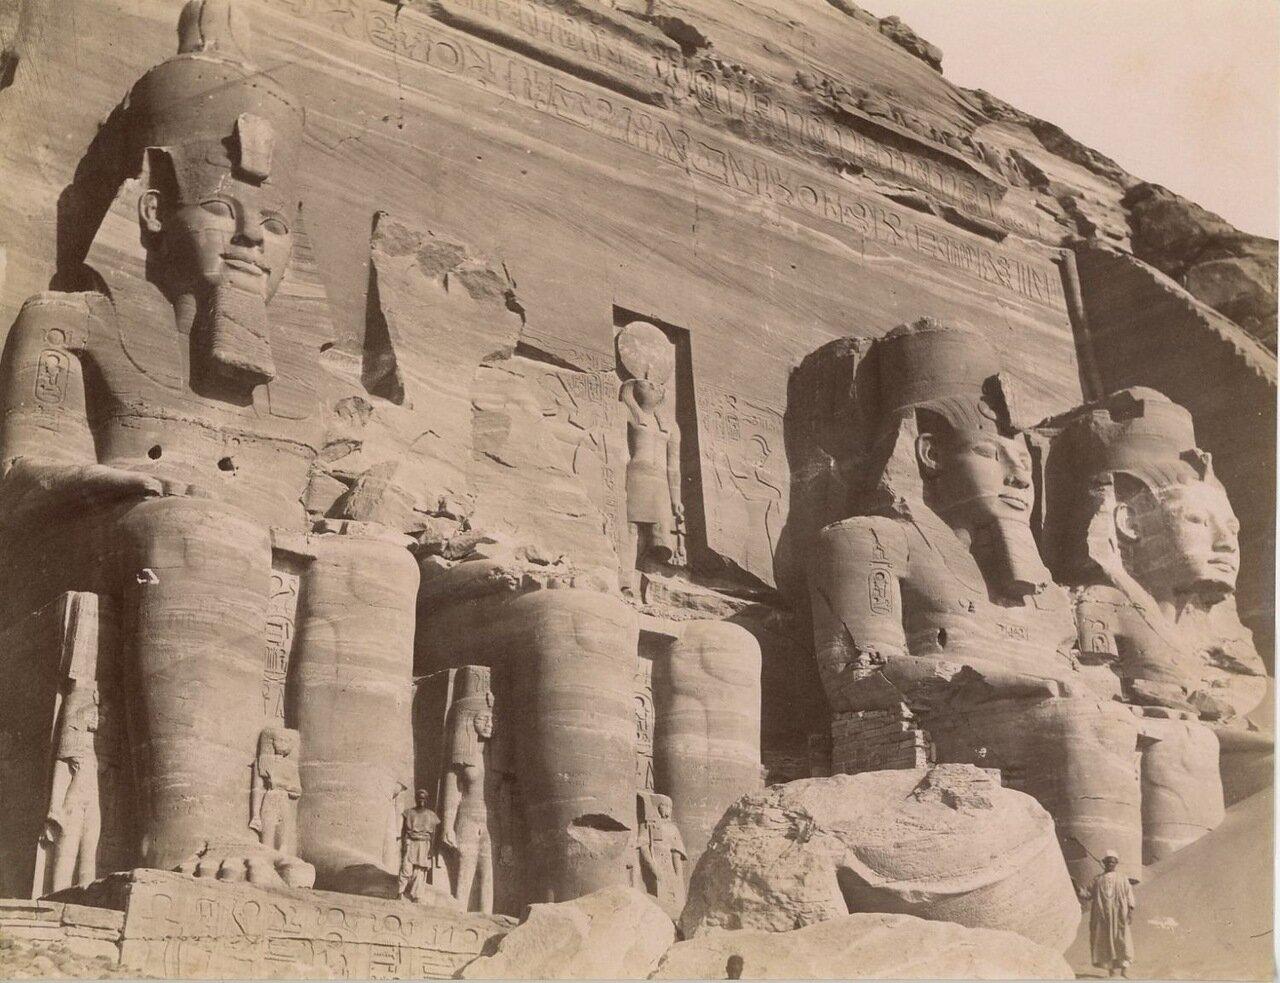 Абу-Симбел. 1880